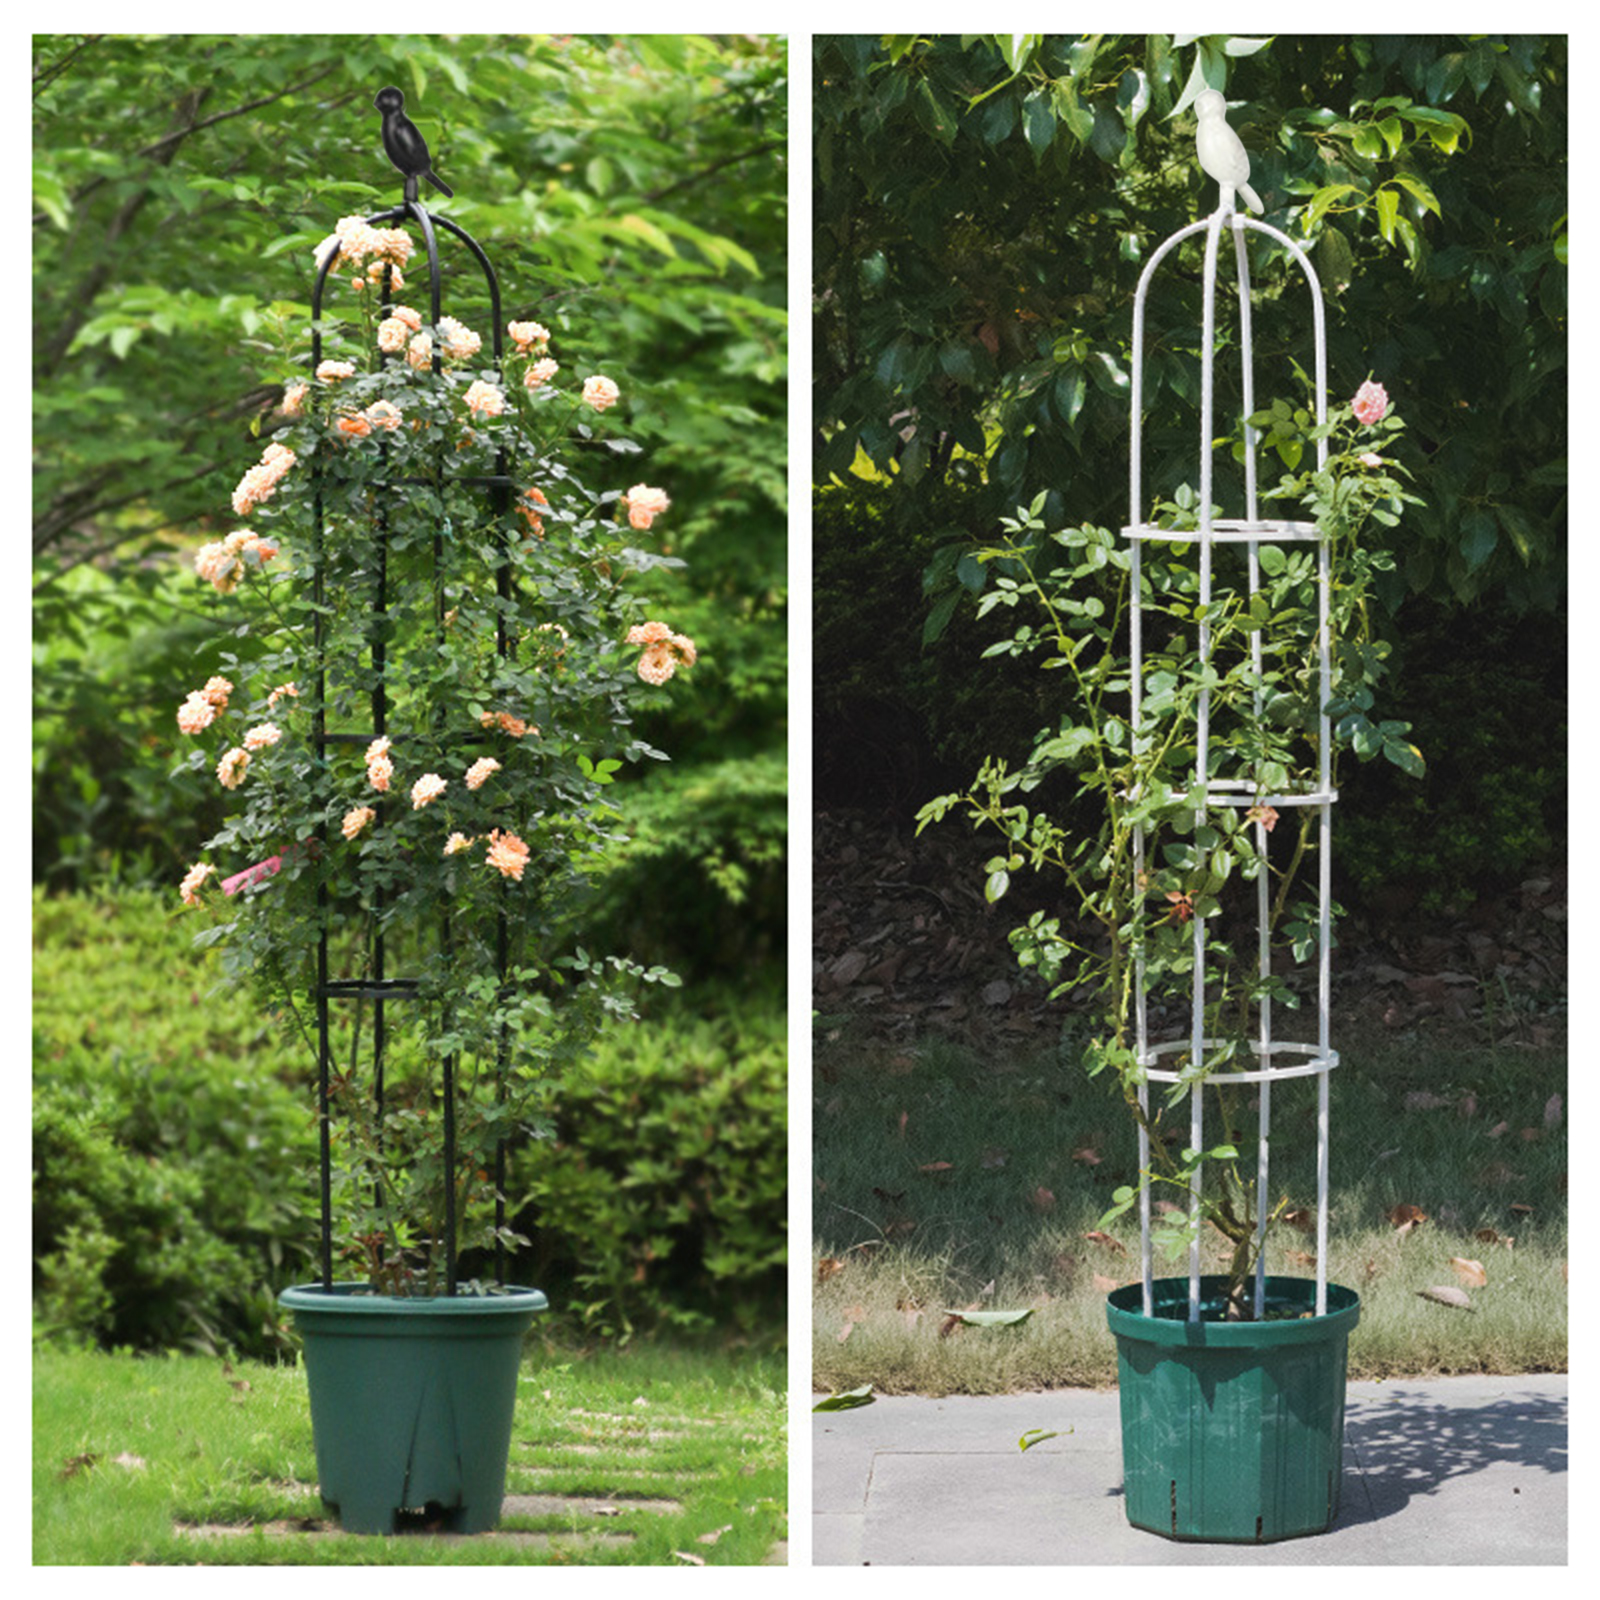 [Livejoy] 150CM Splicing Plant Climbing Frame Outdoor Flower Stand European Flower Stand Climbing Plant Flower Stand Garden Trellis Obelisk